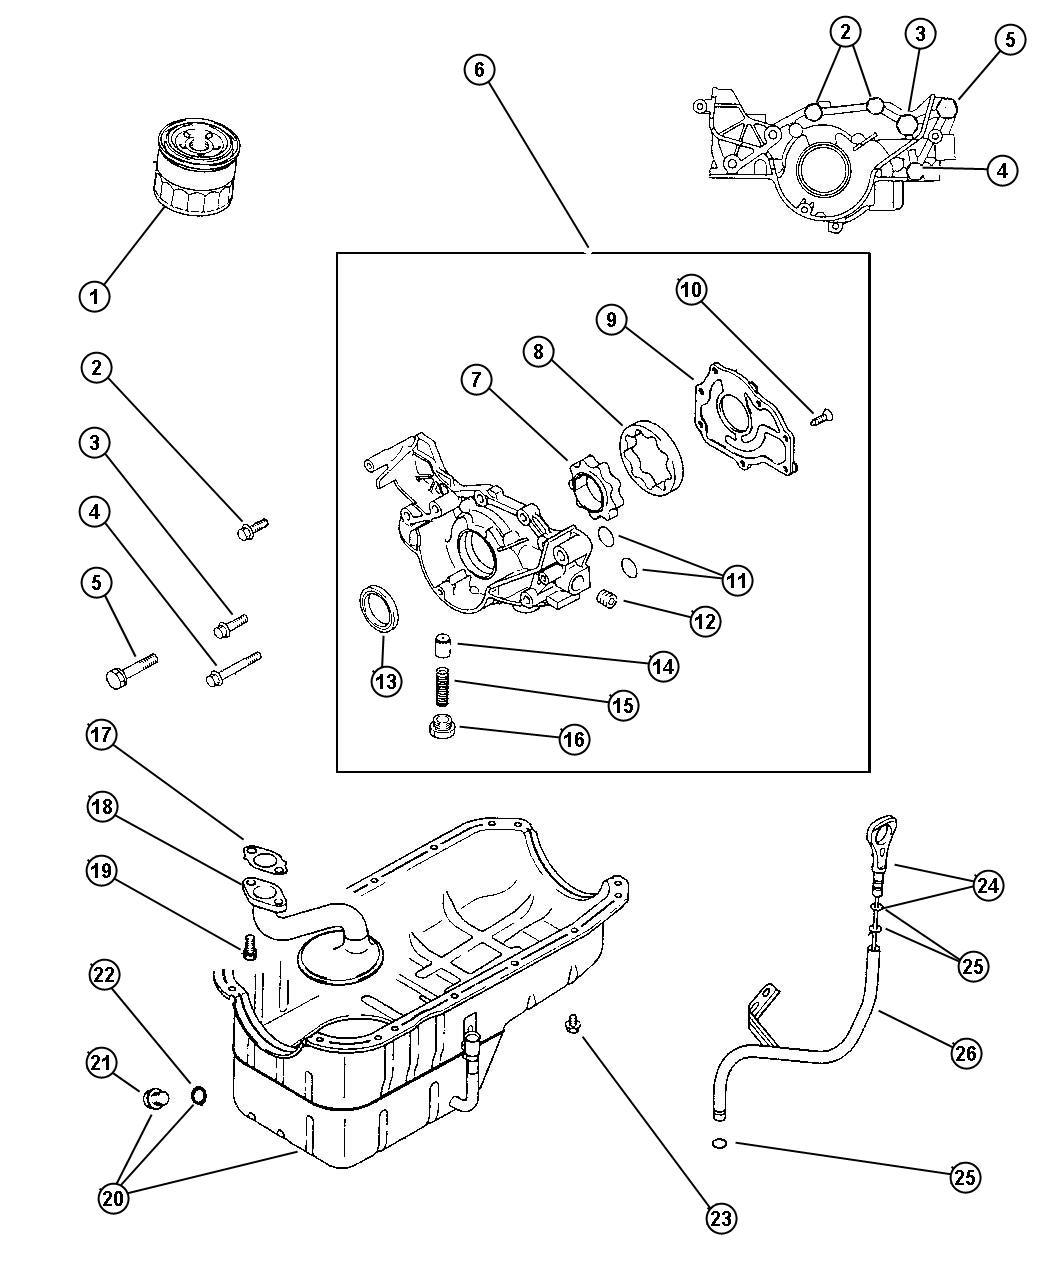 Dodge Stratus Plug. Cylinder block oil hole. Engine oil